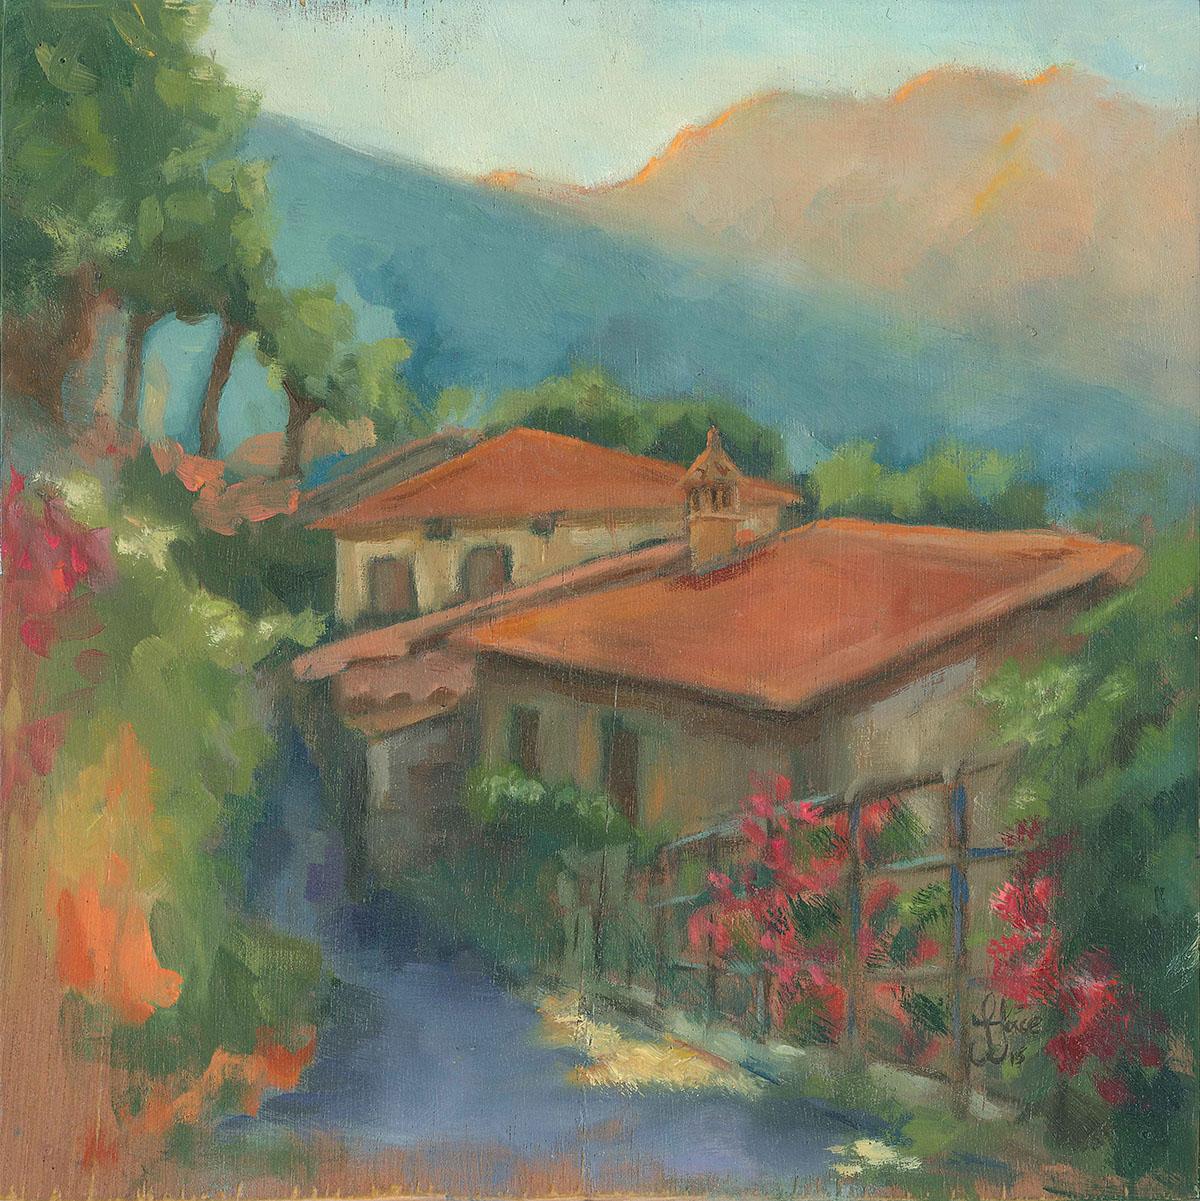 Sunrise in Stazzema - Oil on wood - 20 x 20 cm